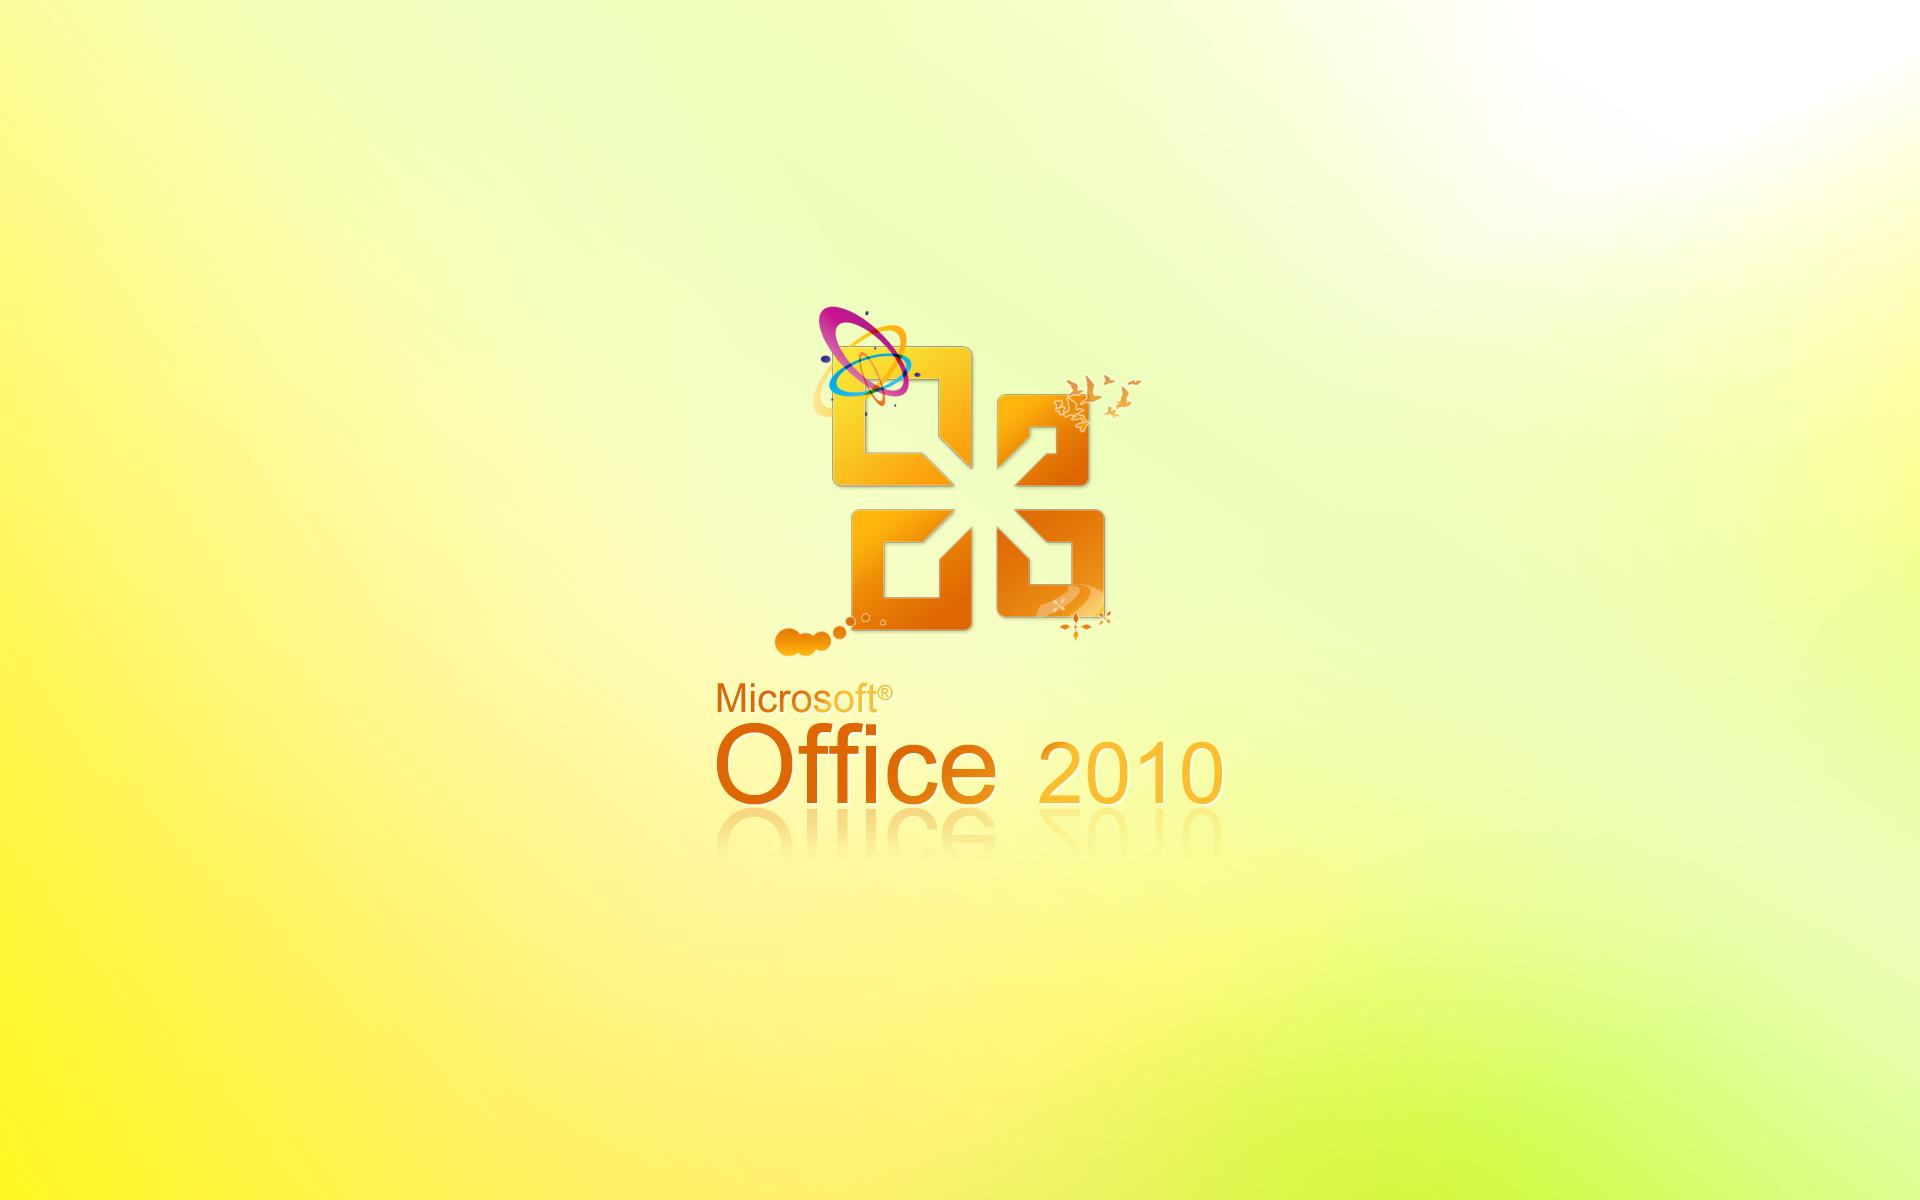 ??????????????????? Microsoft office 2010 - YouTube